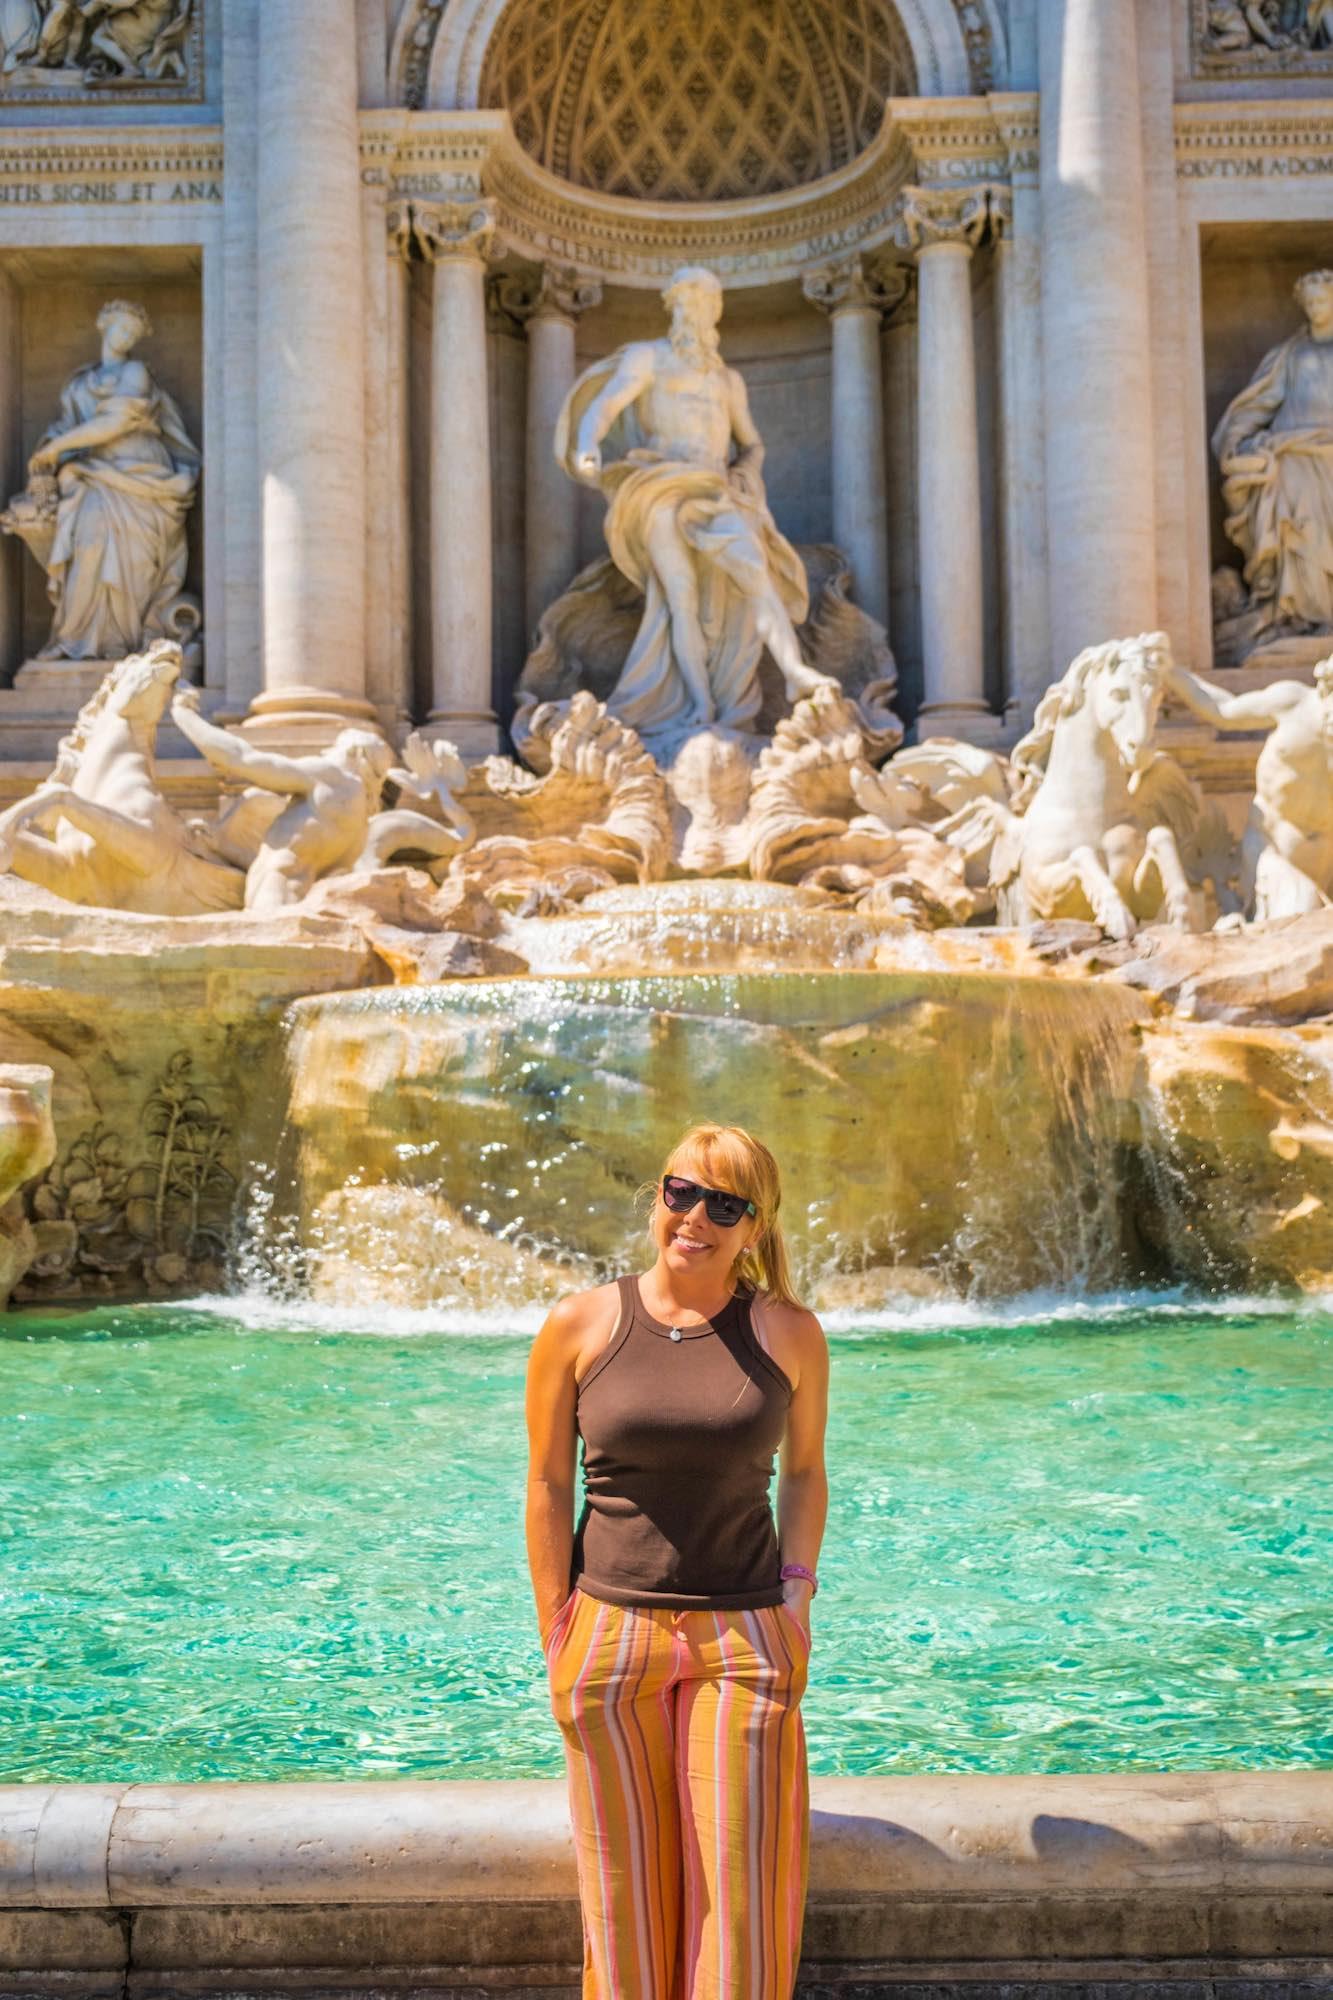 Tasha in front of Trevi Fountain